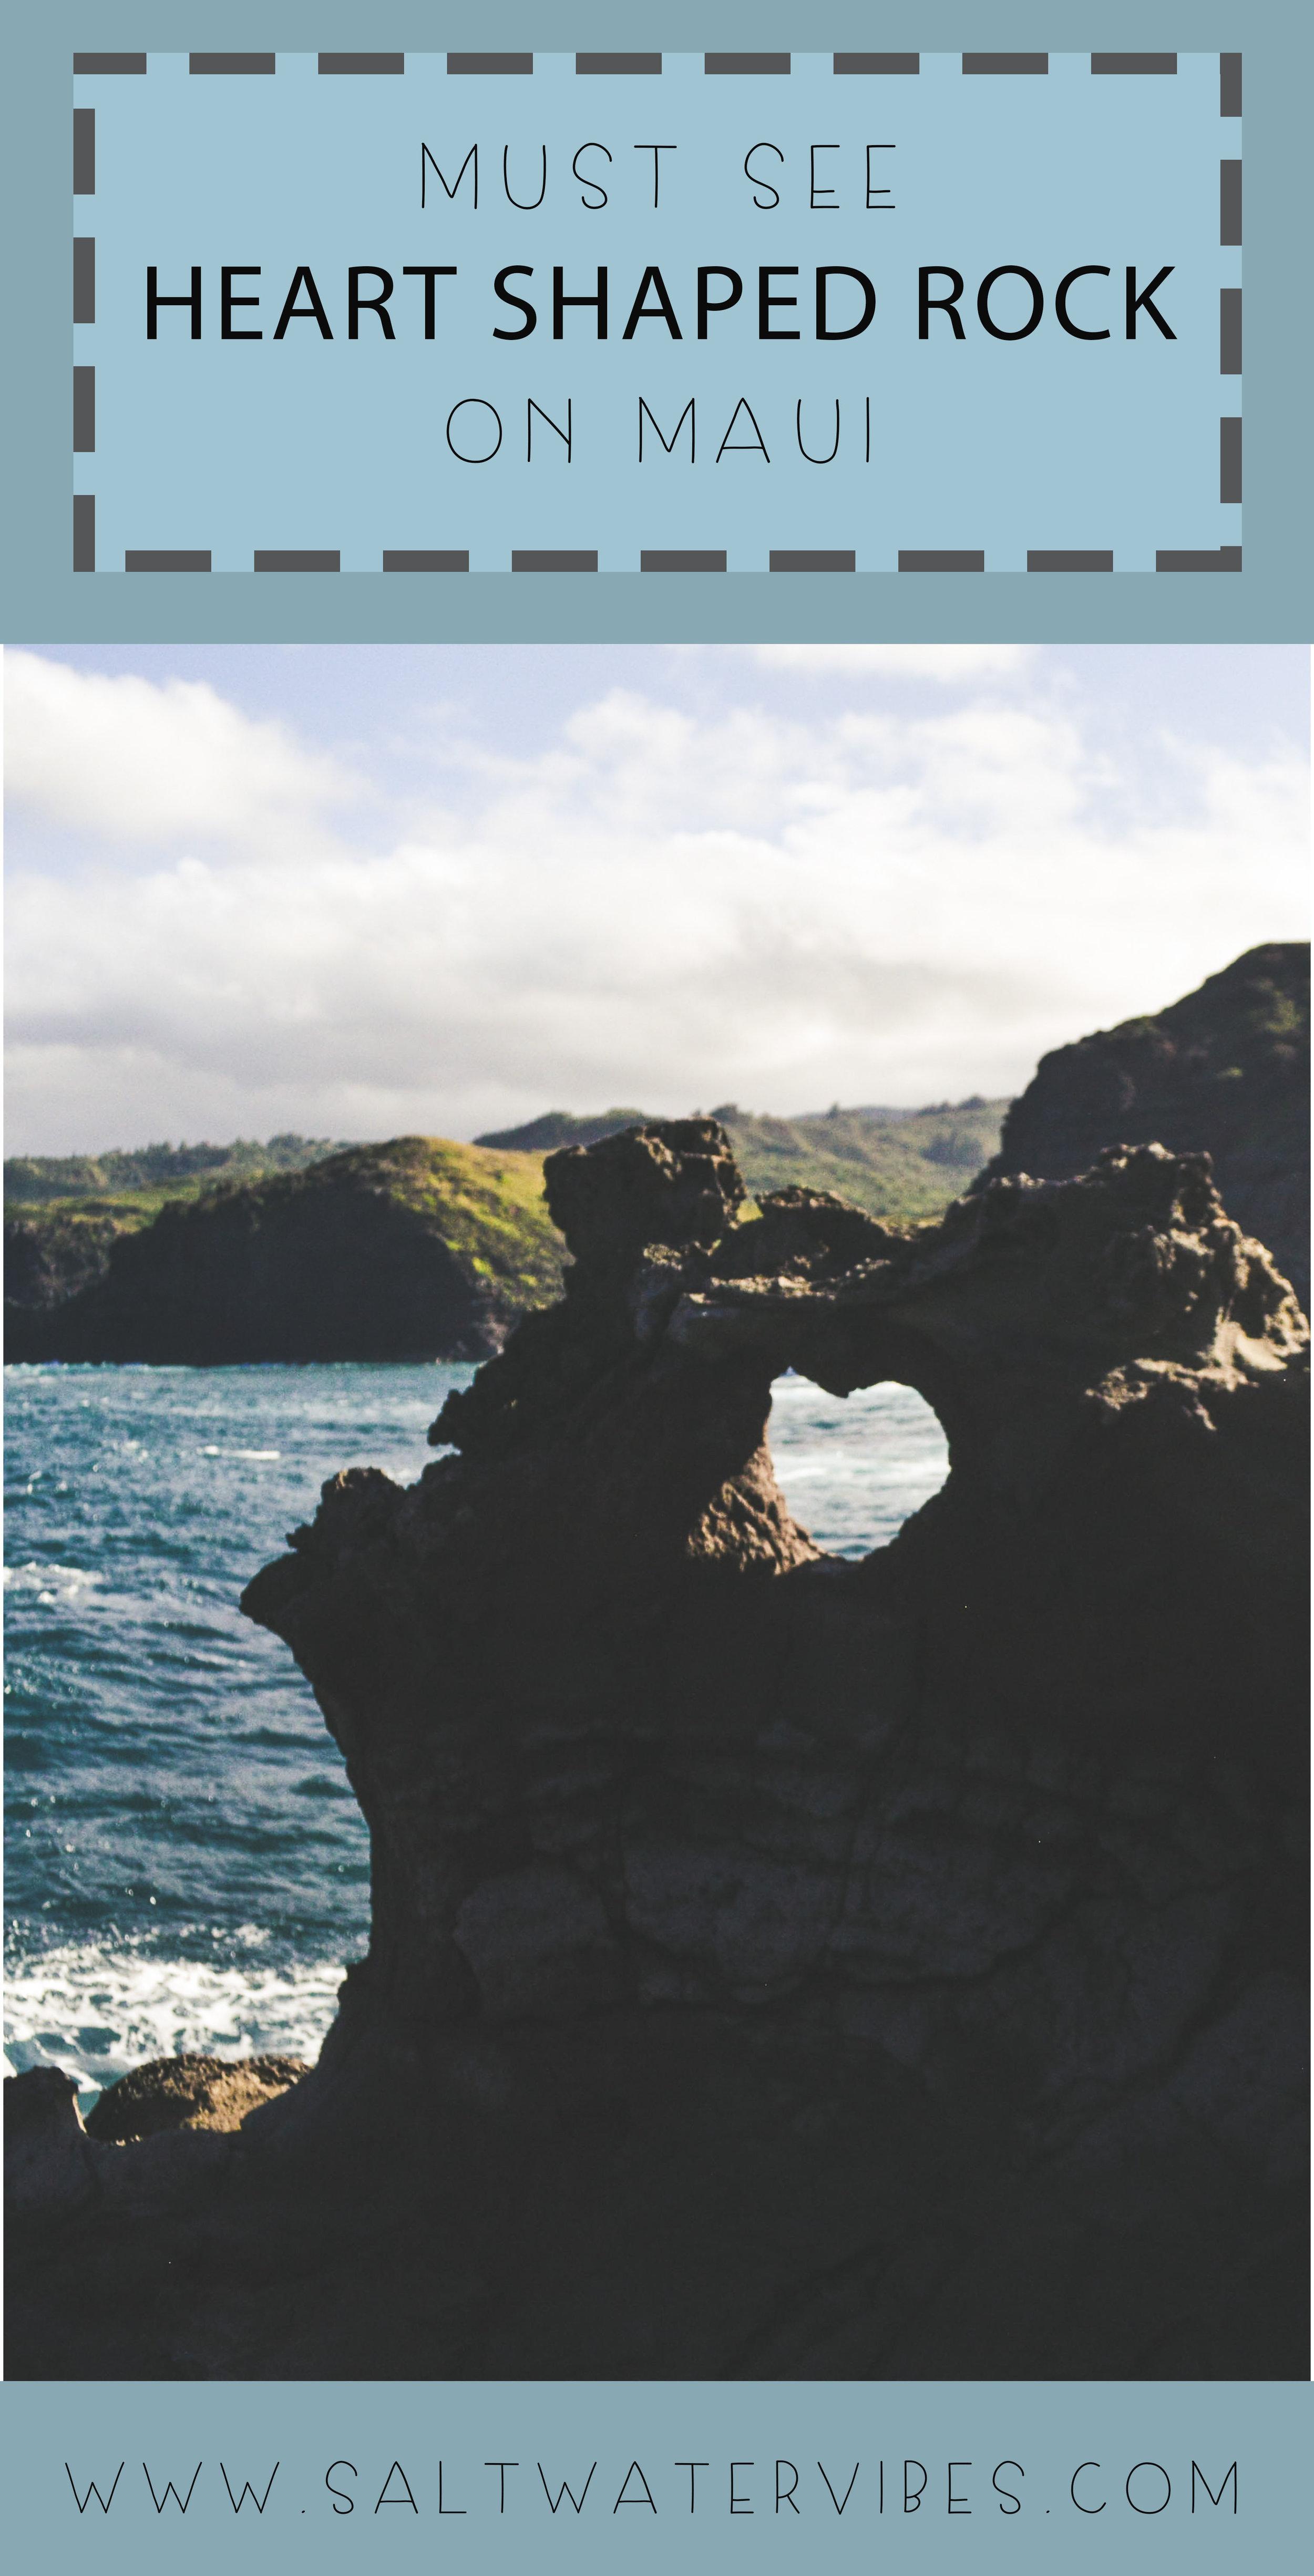 Heart Shaped Rock + SaltWaterVibes